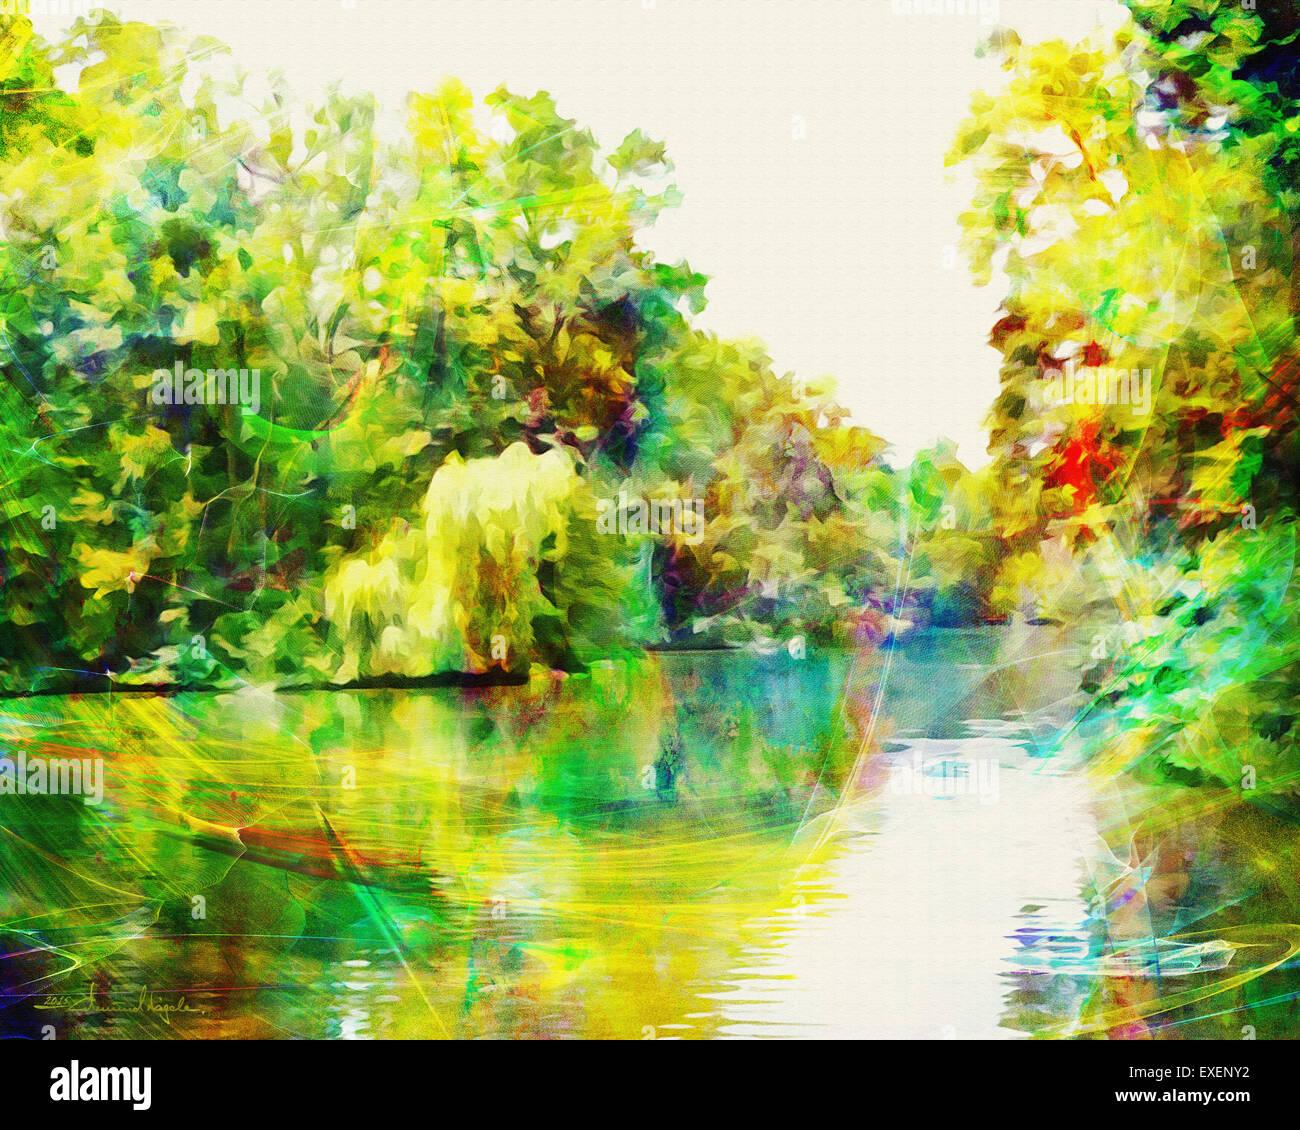 DIGITAL ART: Nymphenburg Park at Munich (Germany/Bavaria) - Stock Image